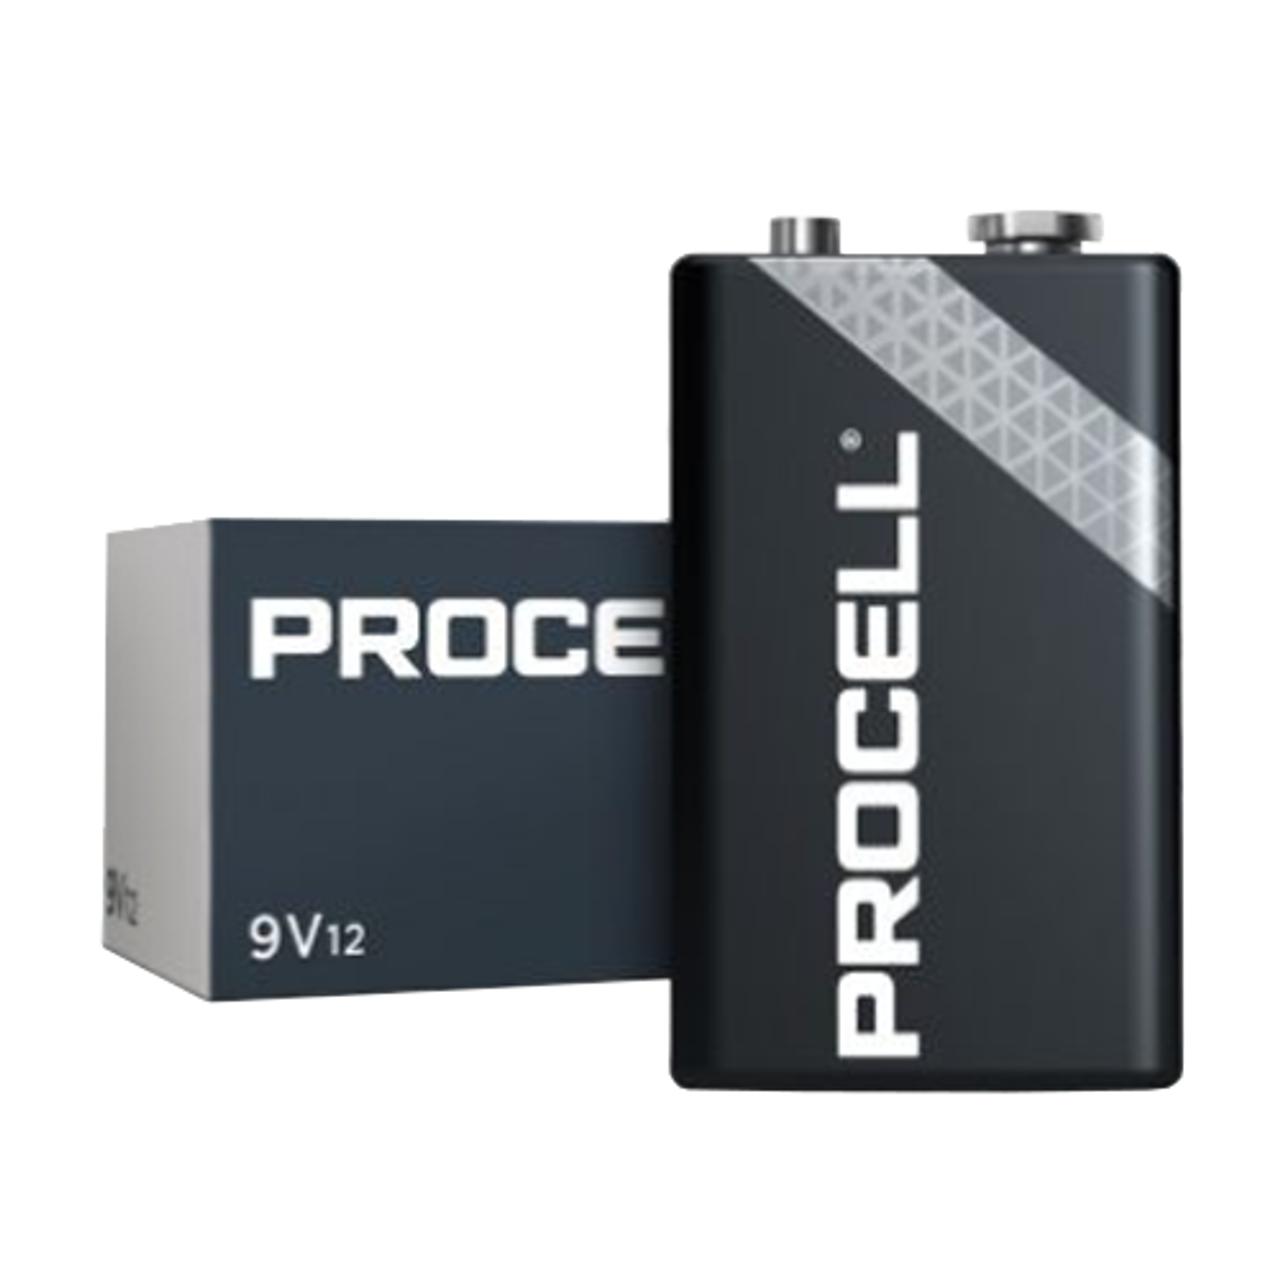 9V Duracell Procell Alkaline Batteries (12 Pack)